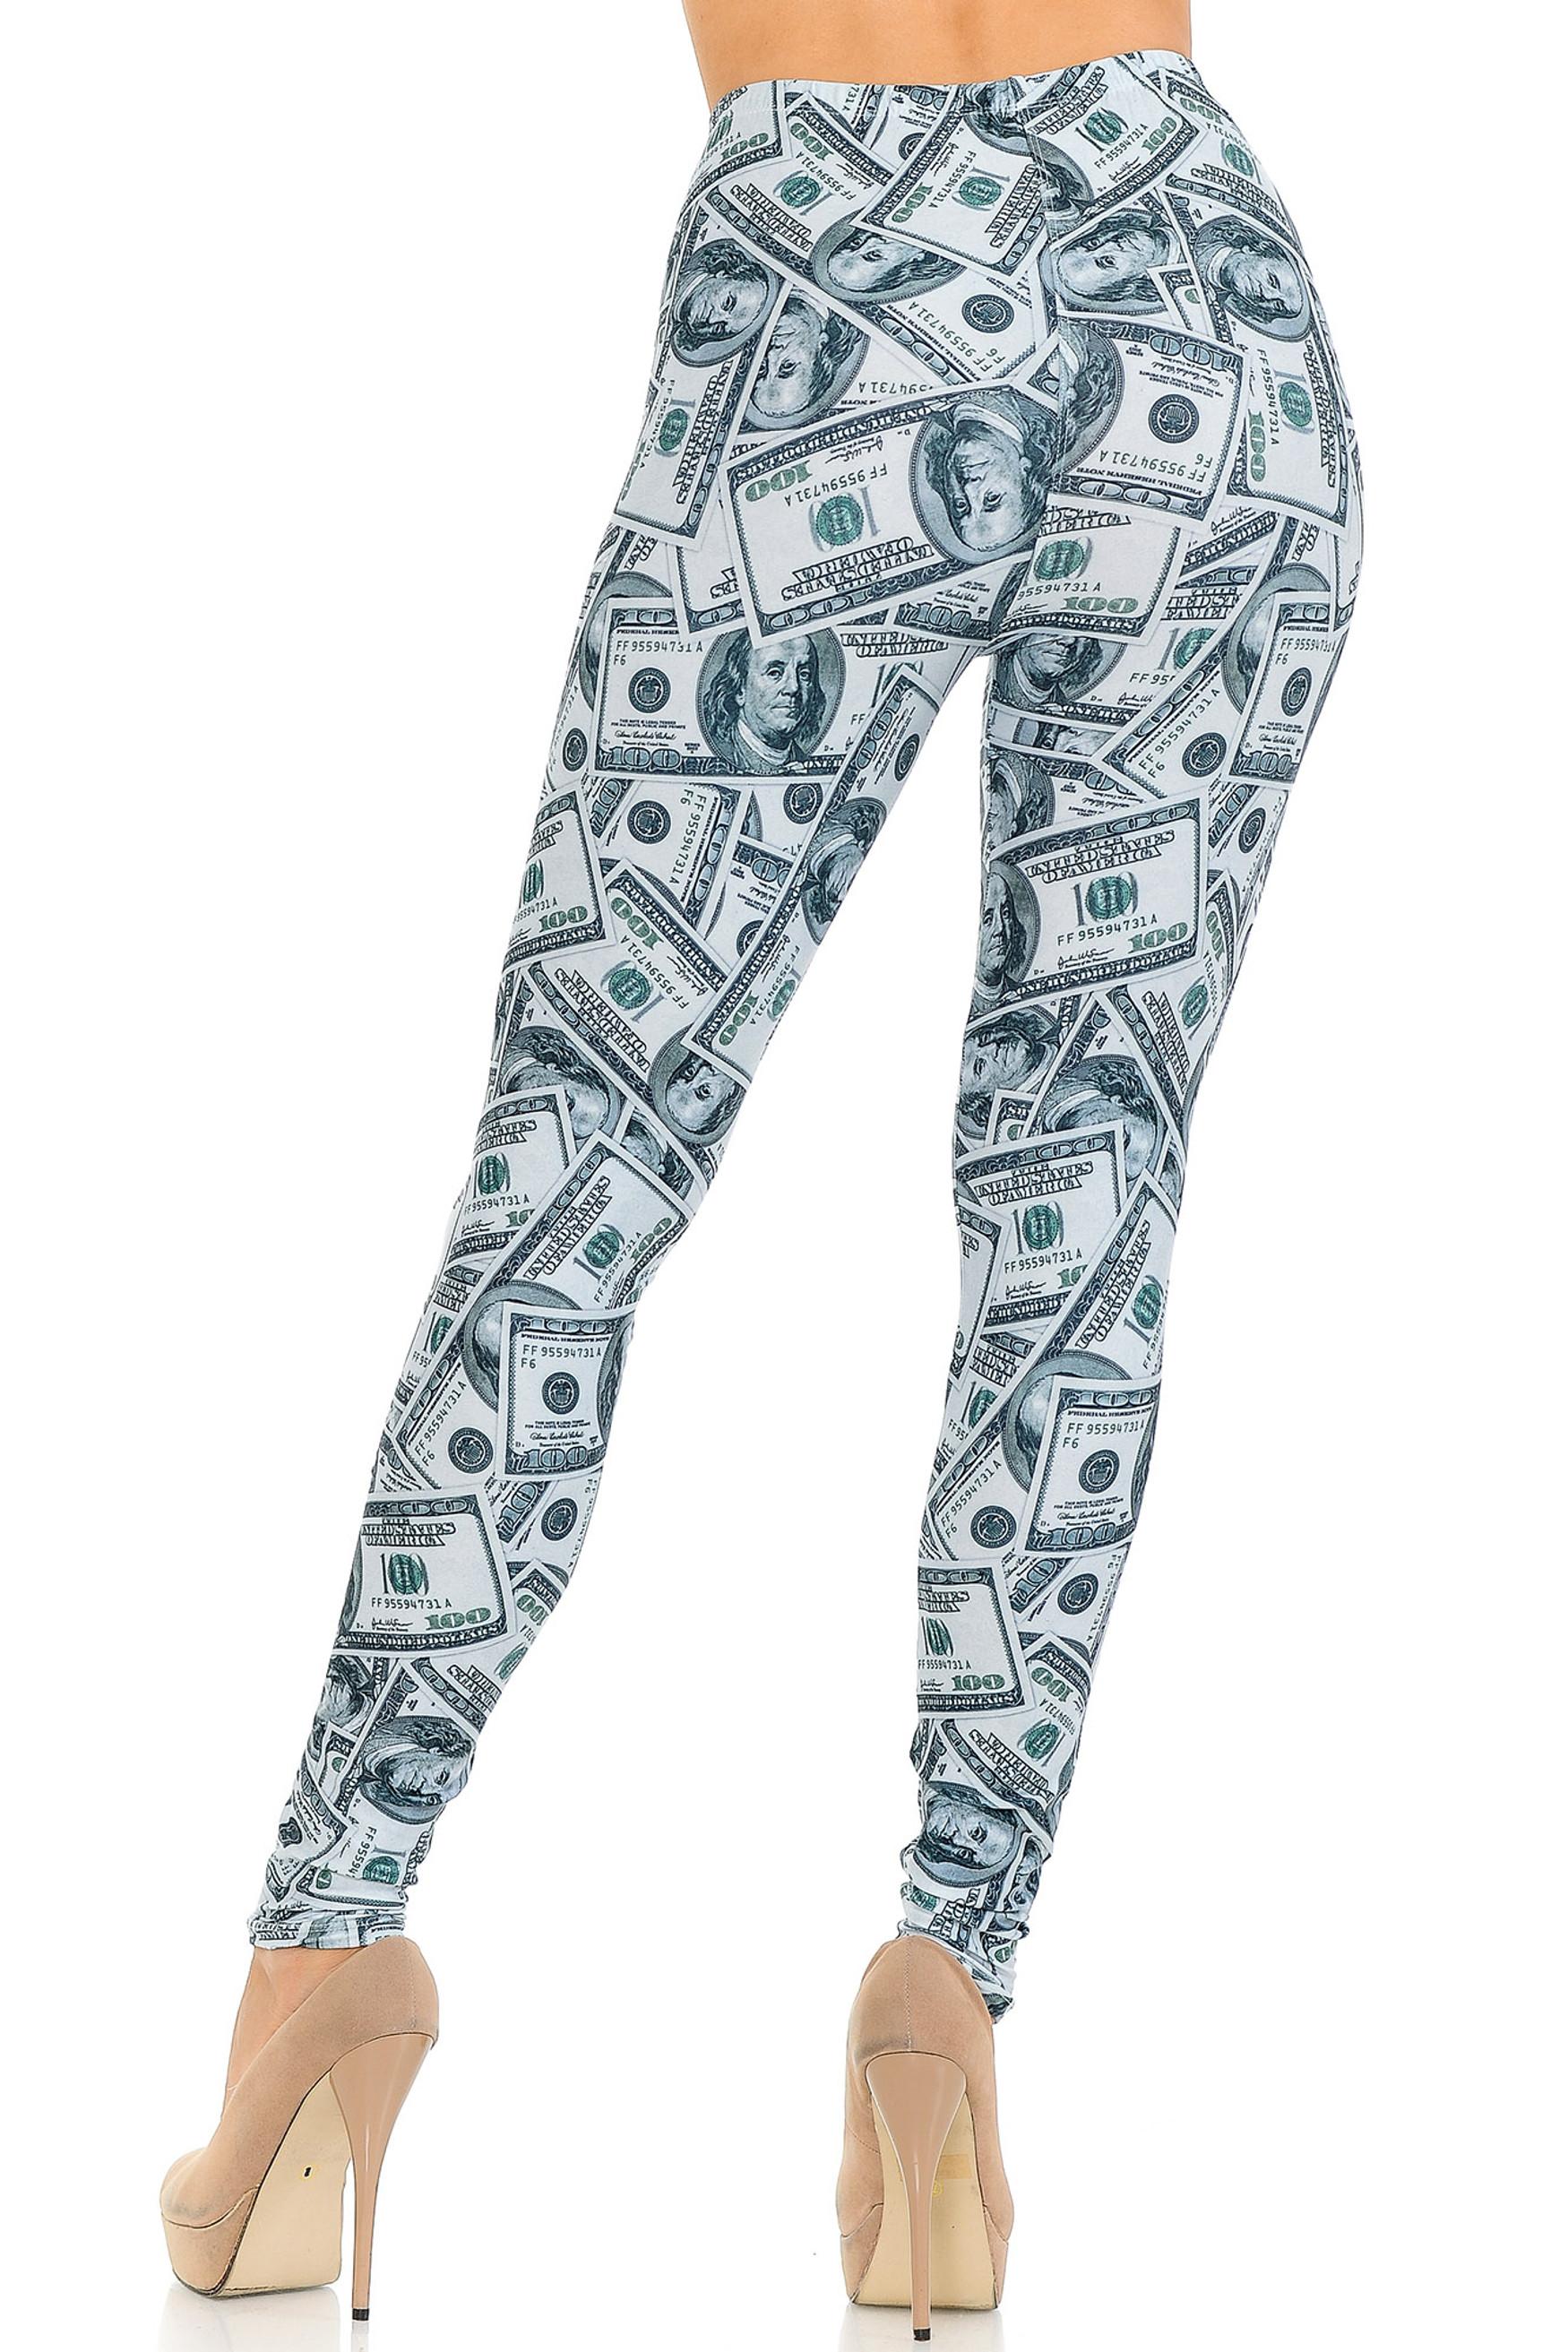 Creamy Soft Raining Money Extra Small Leggings - USA Fashion™